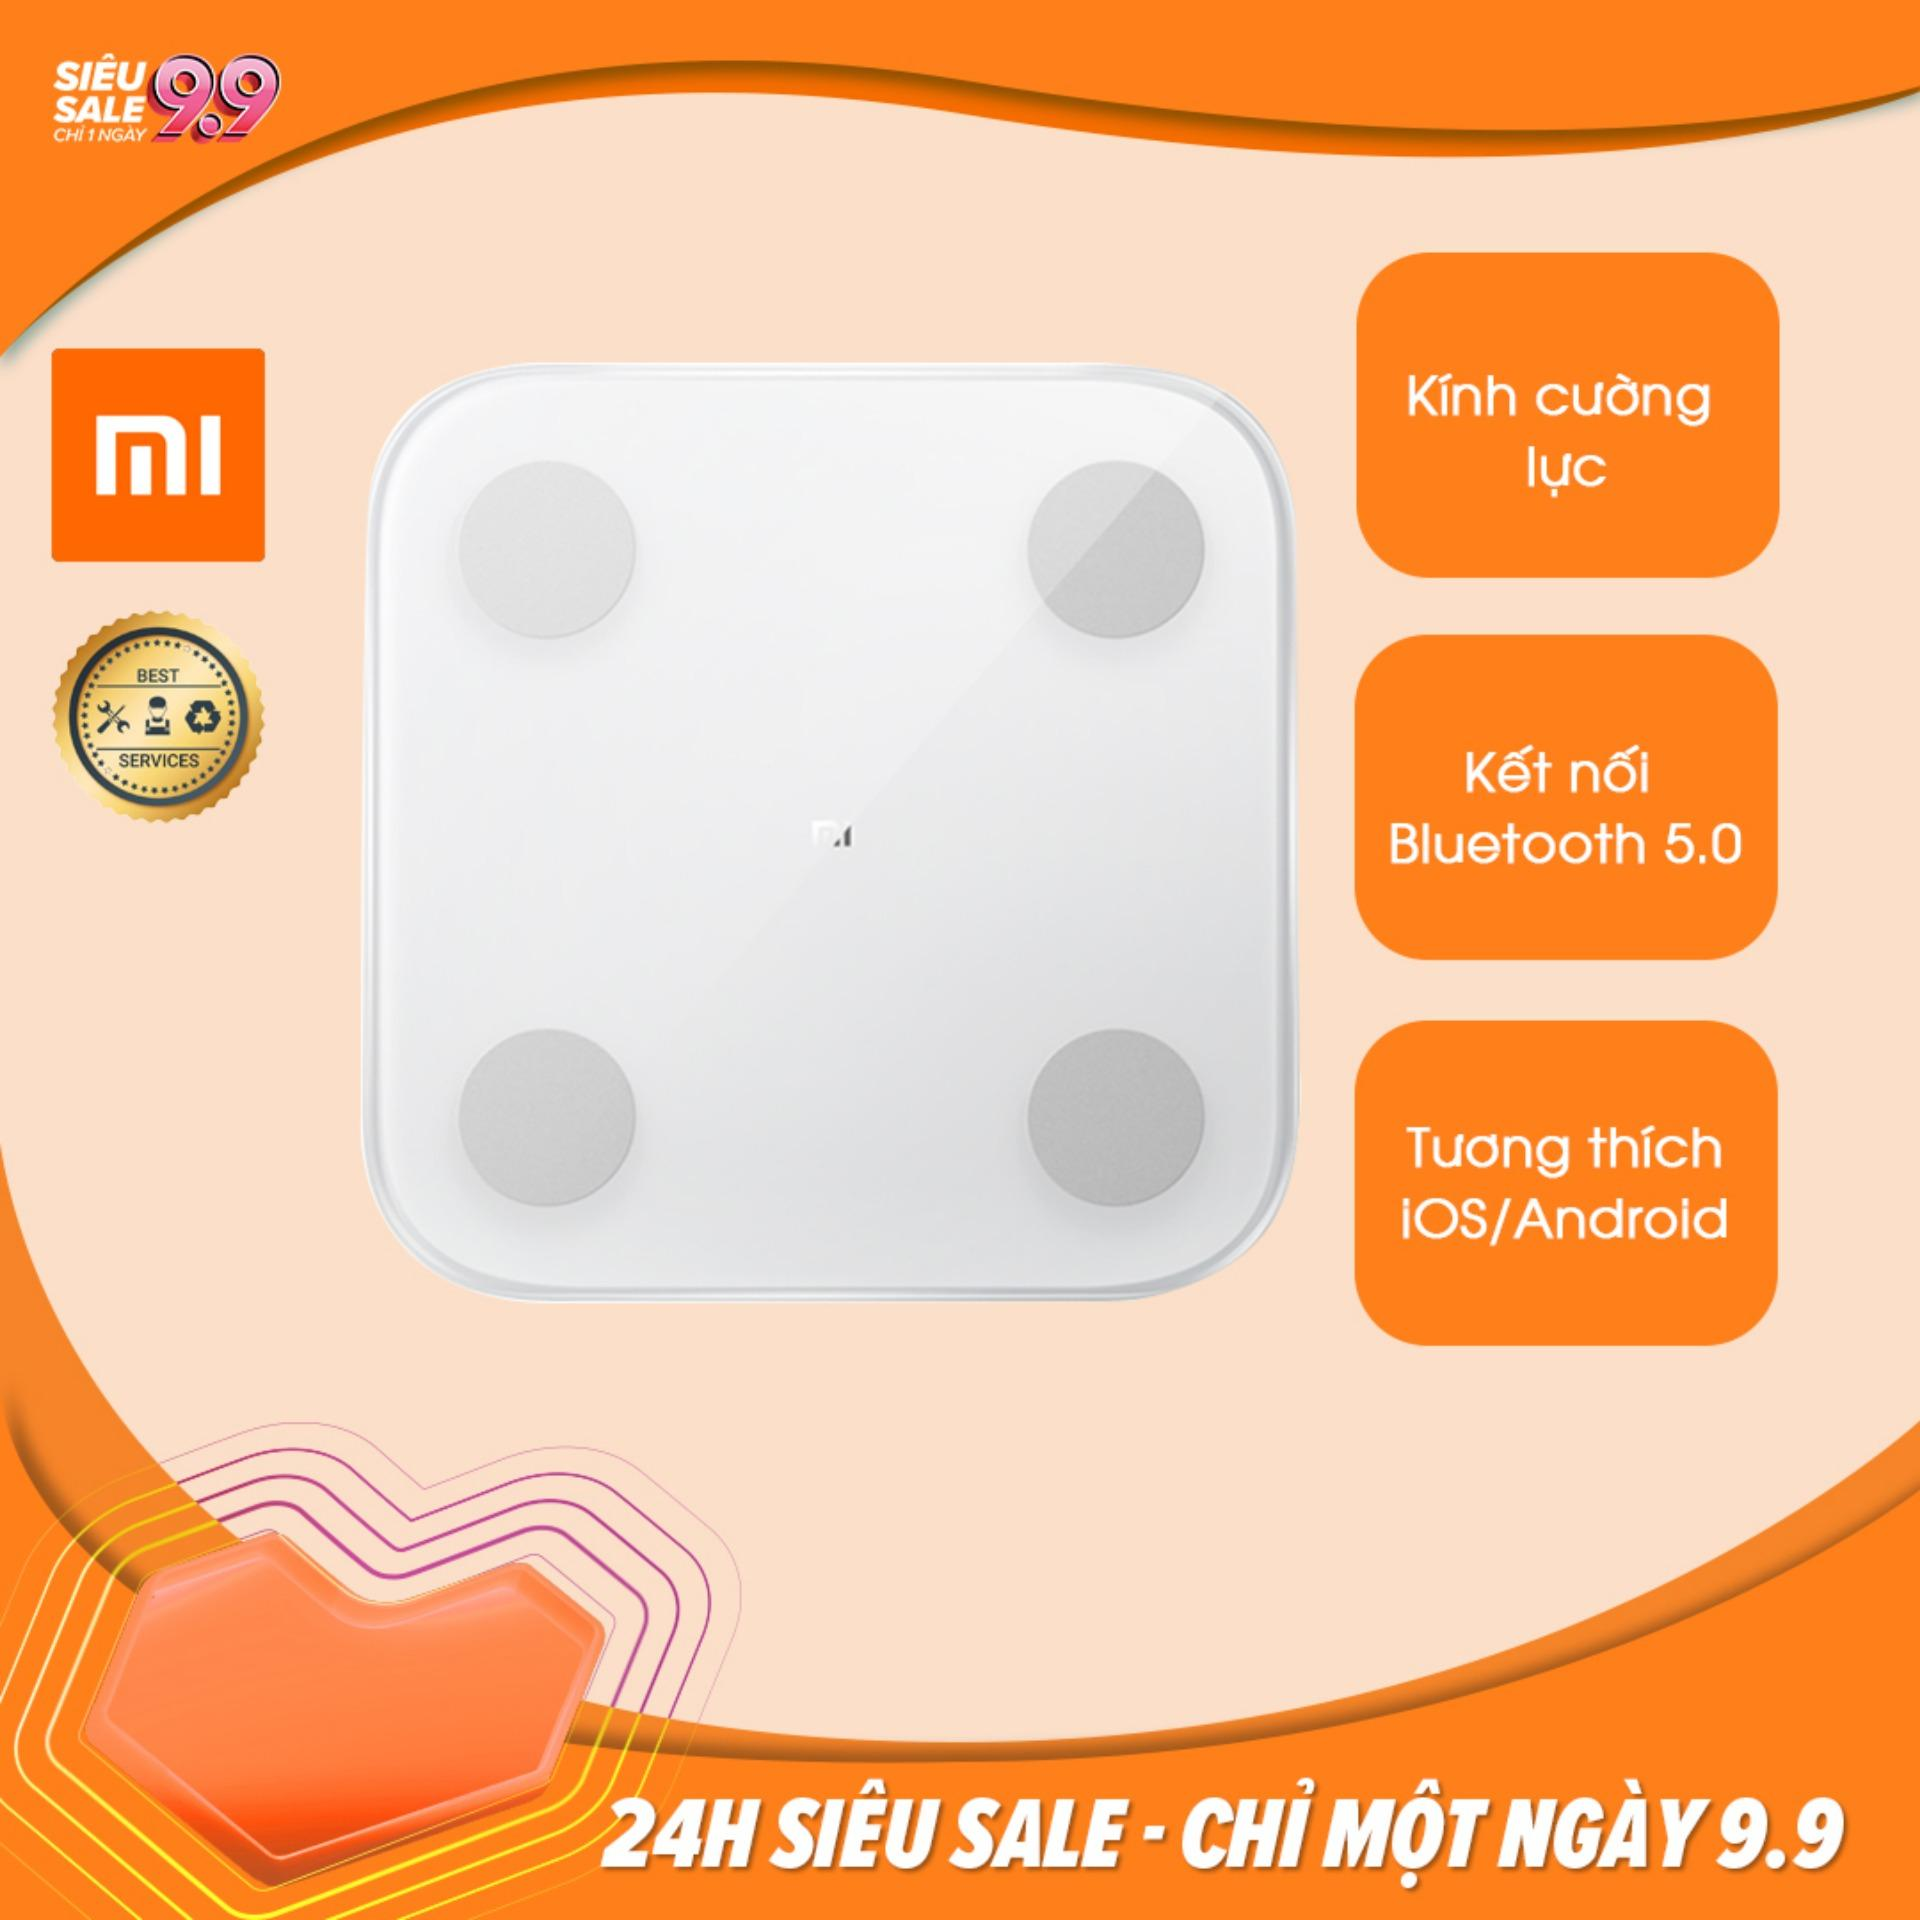 Cân thông minh Xiaomi Mi Body Composition Scale 2 ( Gen 2 ) 2019